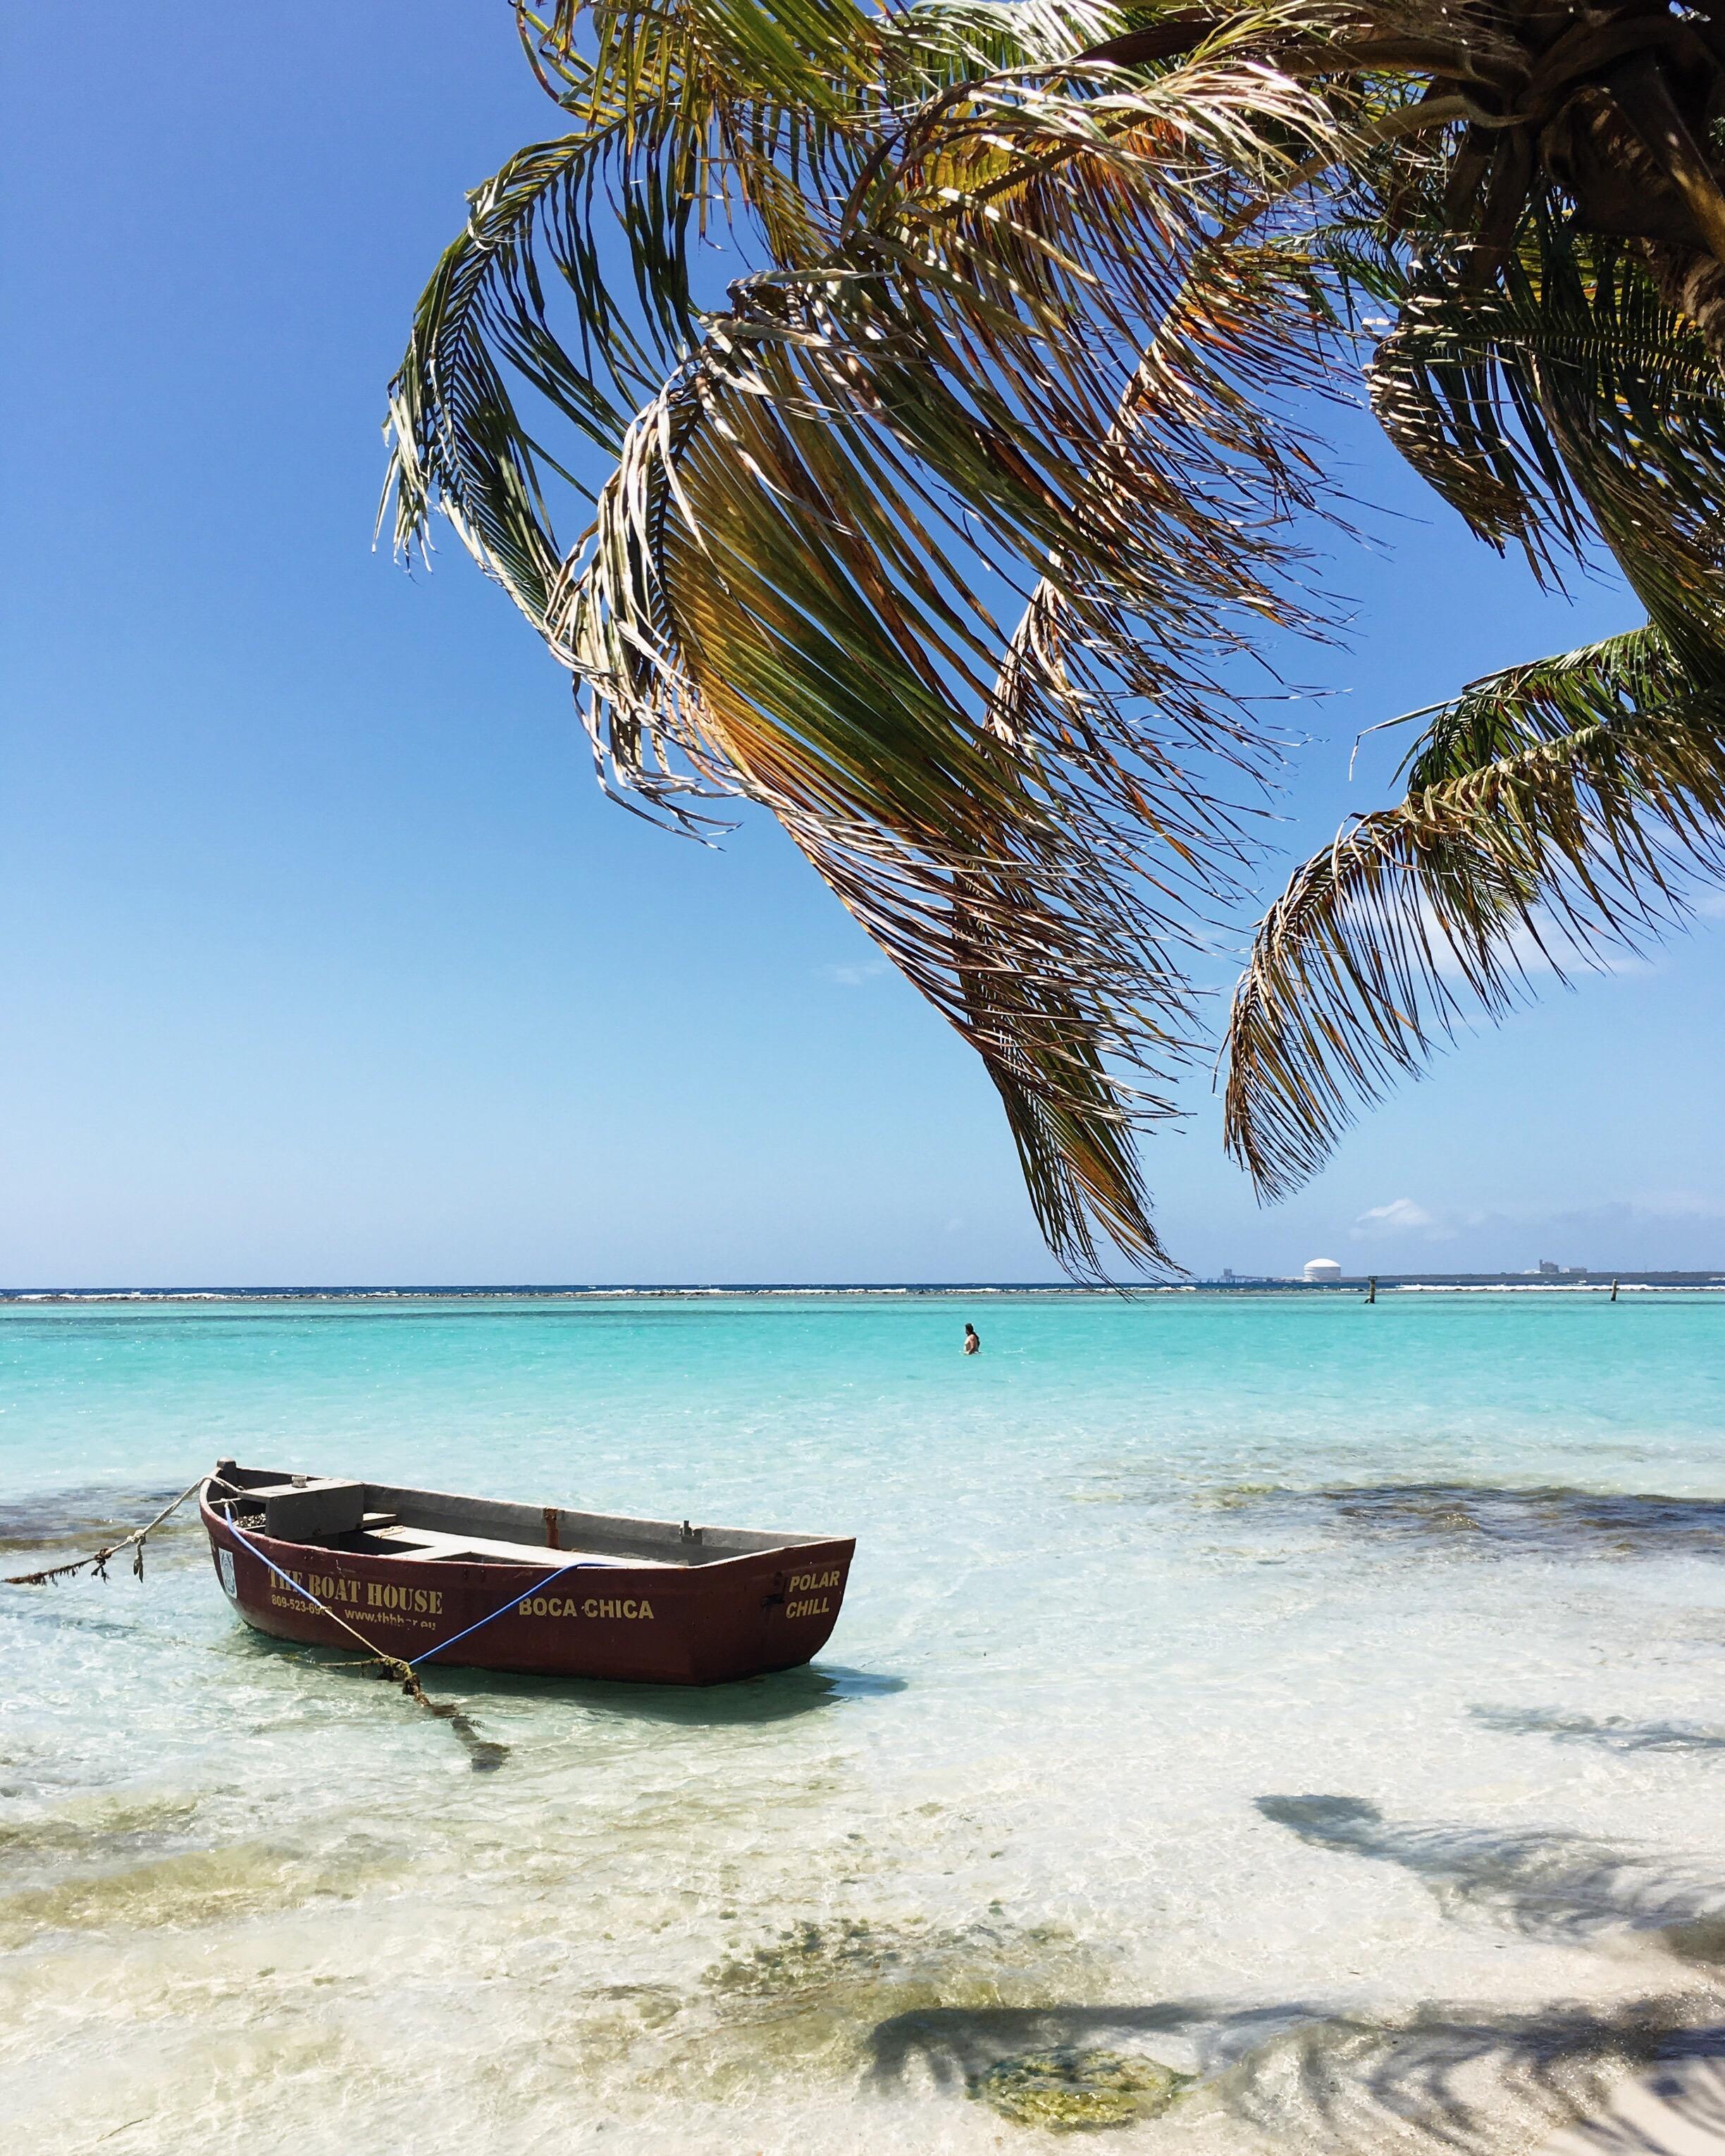 Playa Boca Chica